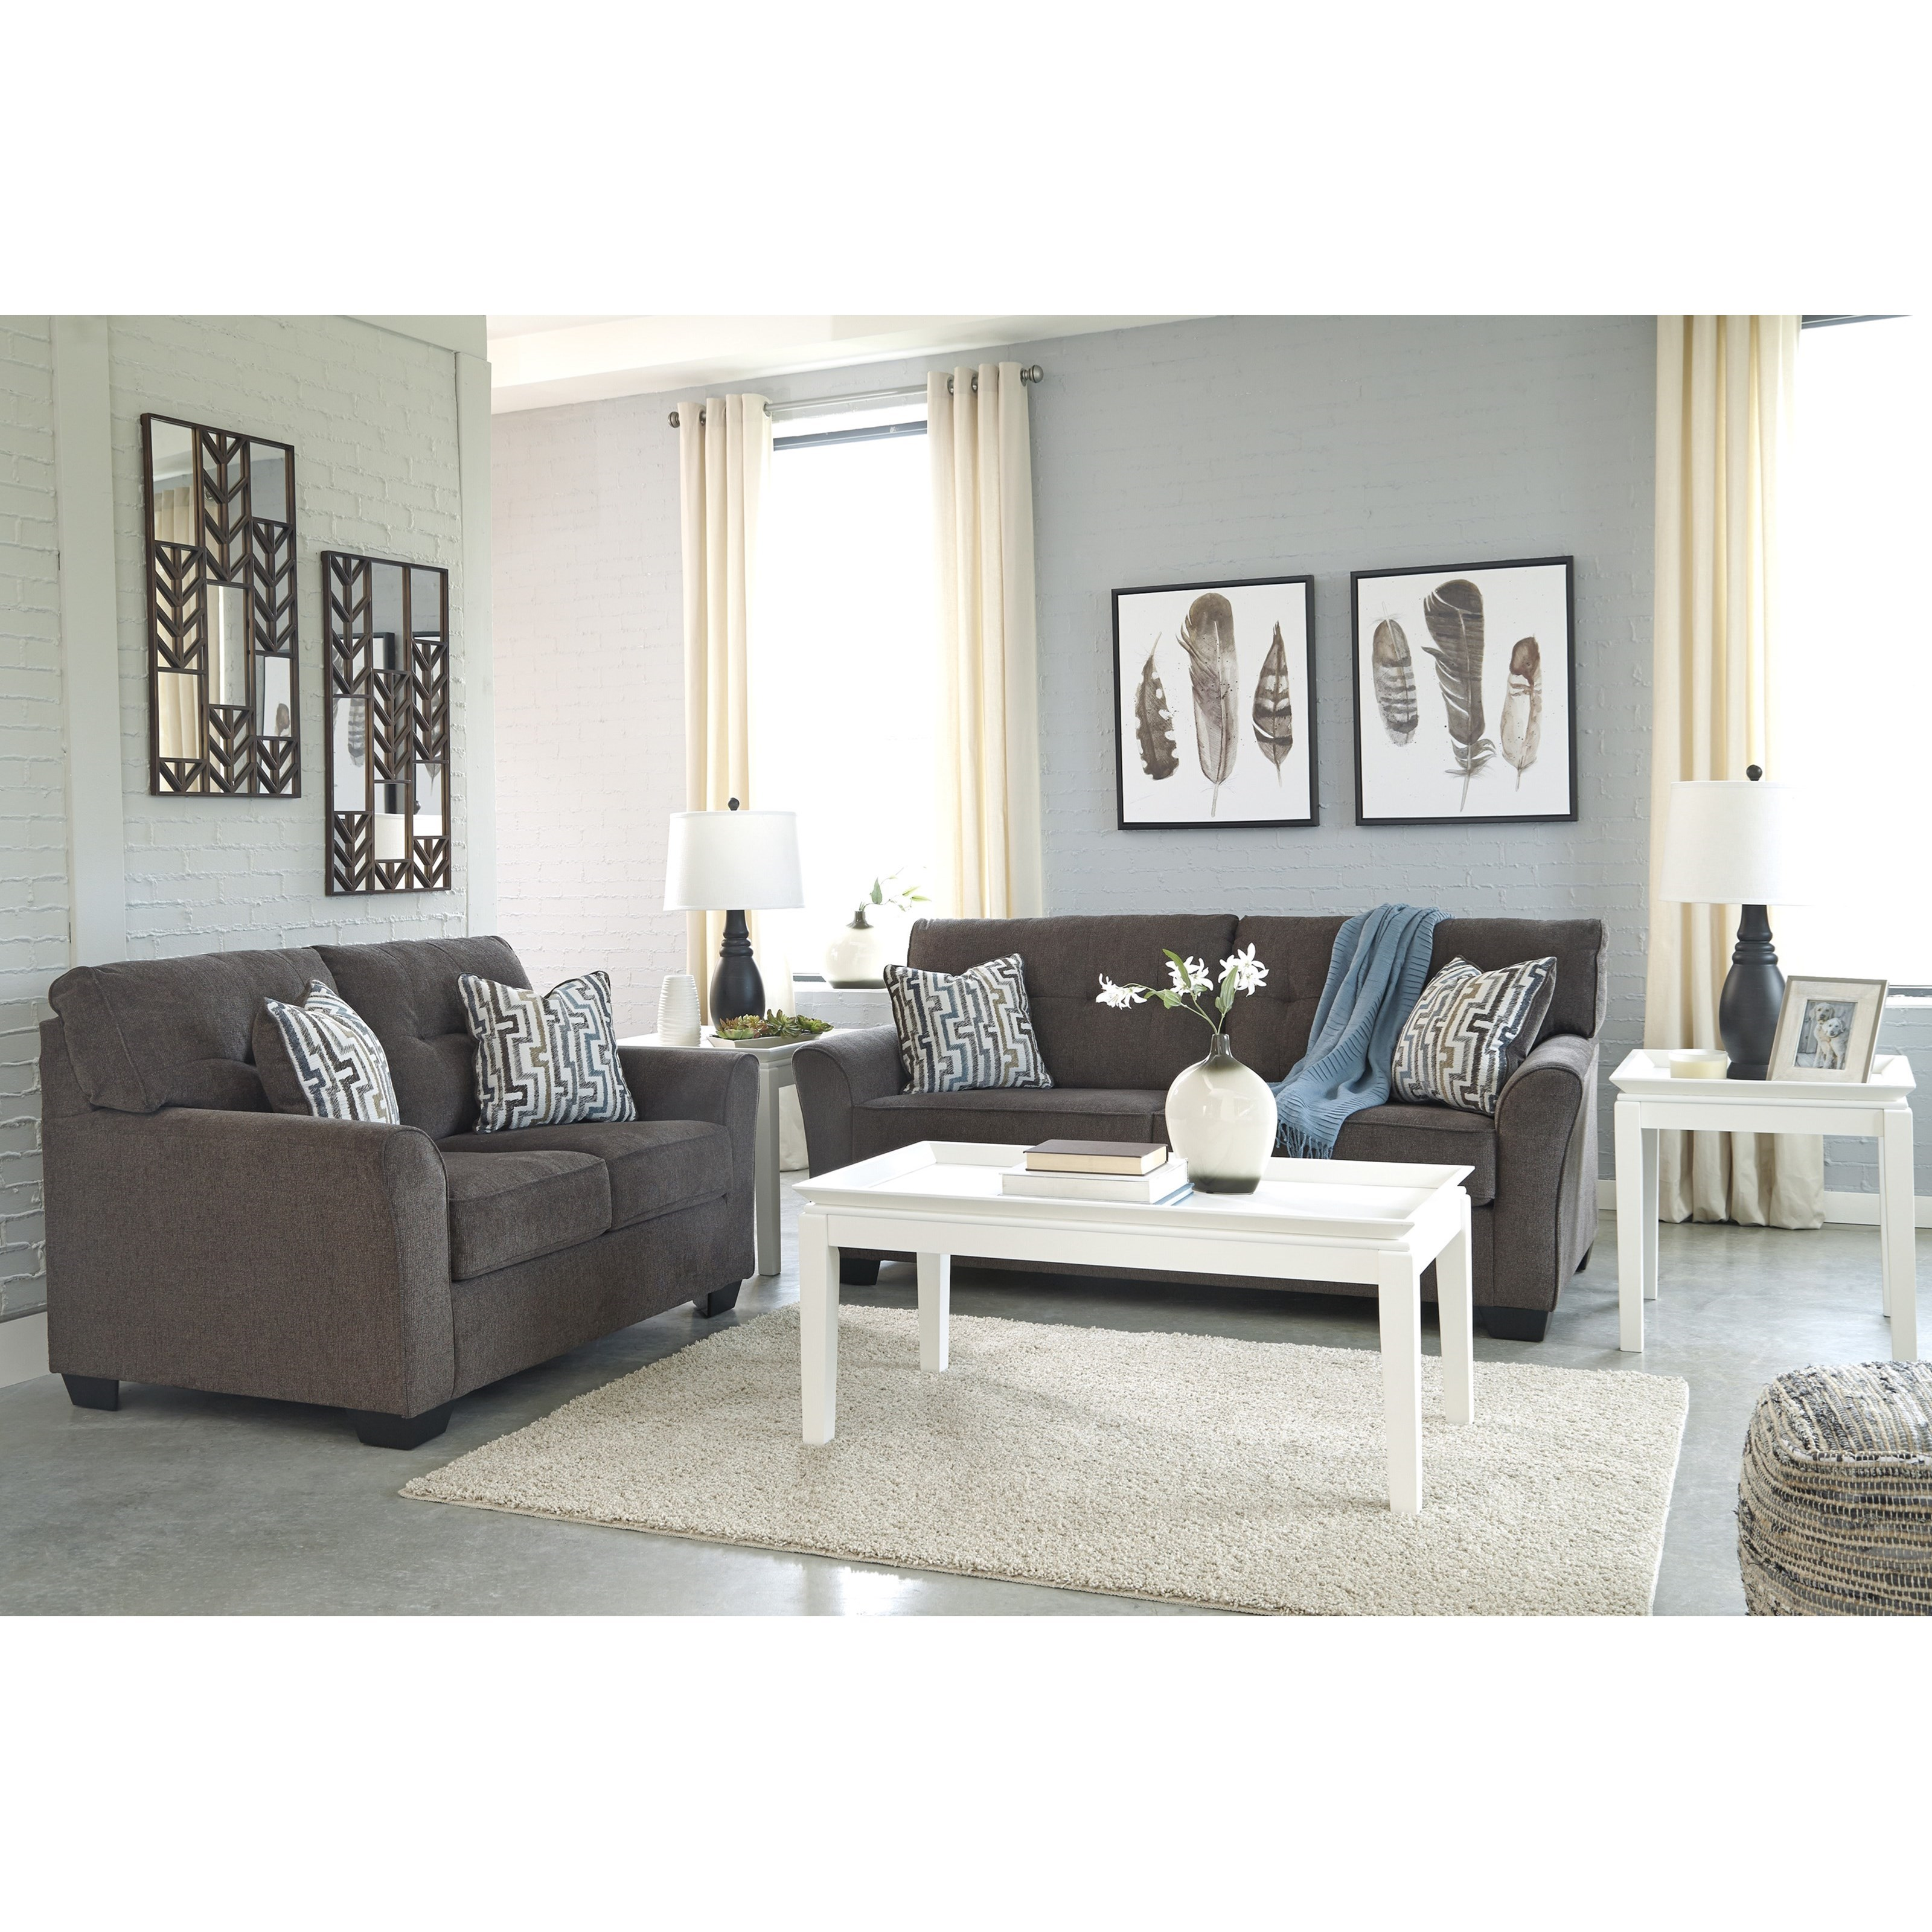 Ashley Furniture Calion Stationary Living Room Group: Signature Design By Ashley Alsen Stationary Living Room